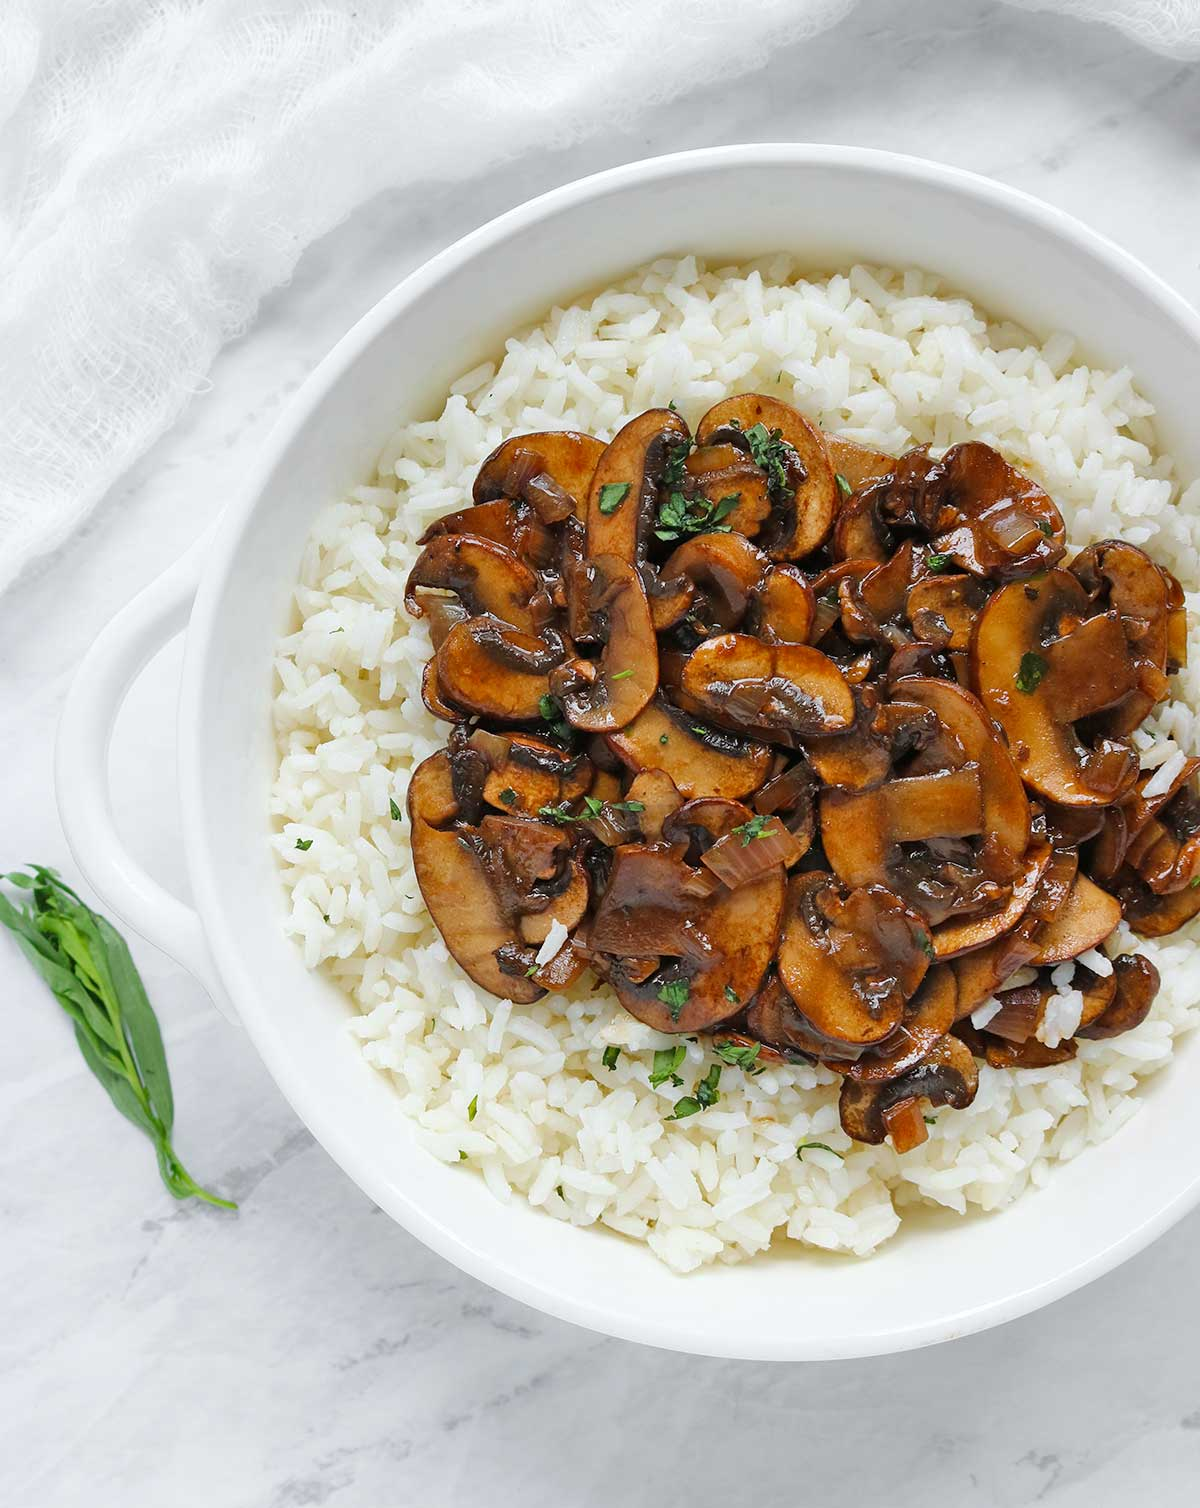 Balsamic Mushrooms with Tarragon Rice | Recipe at SoupAddict.com